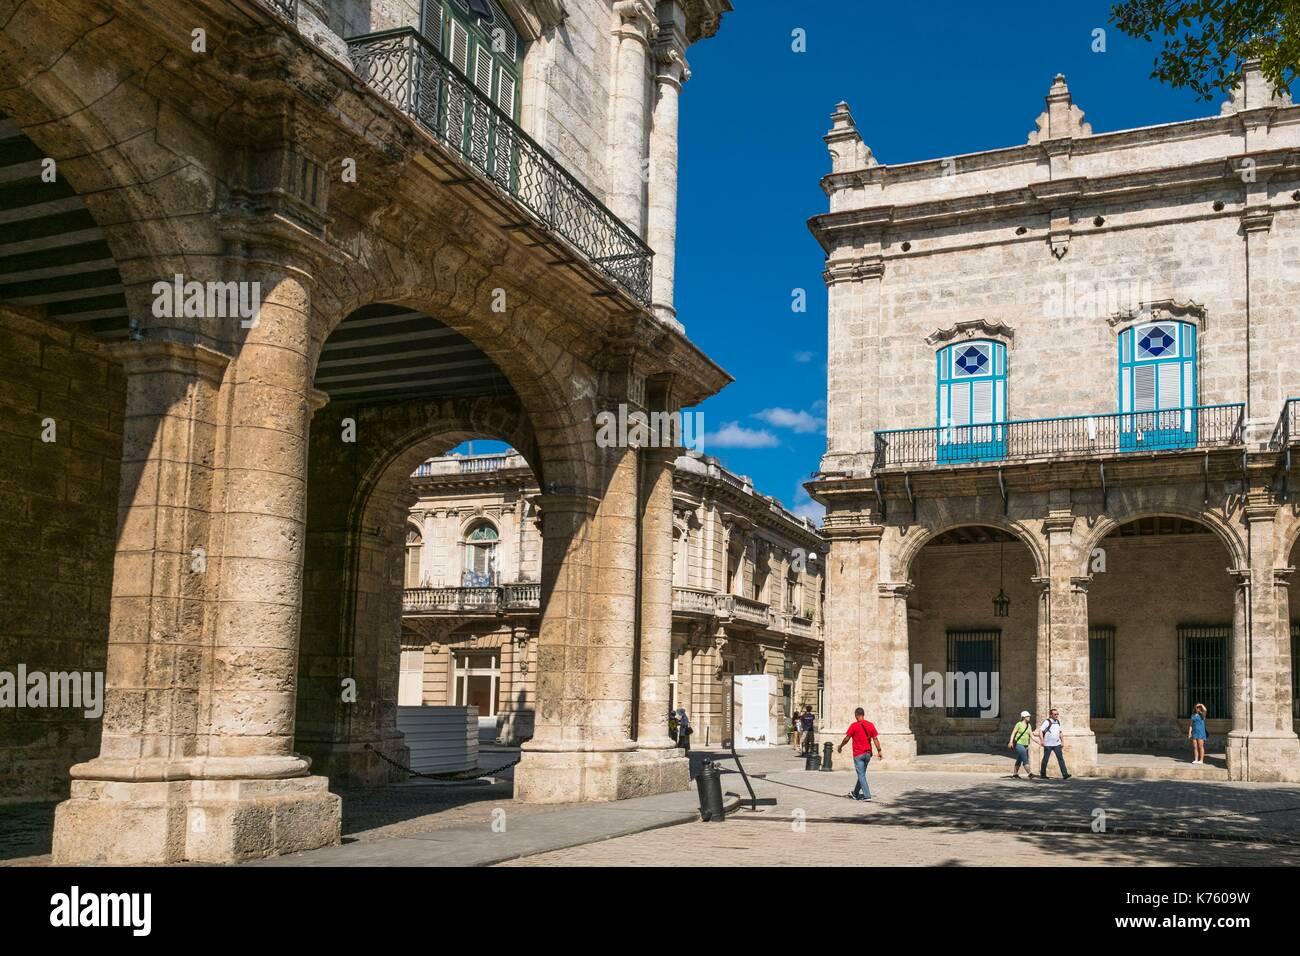 Capitanes Generales Habana Stock Photos & Capitanes ...